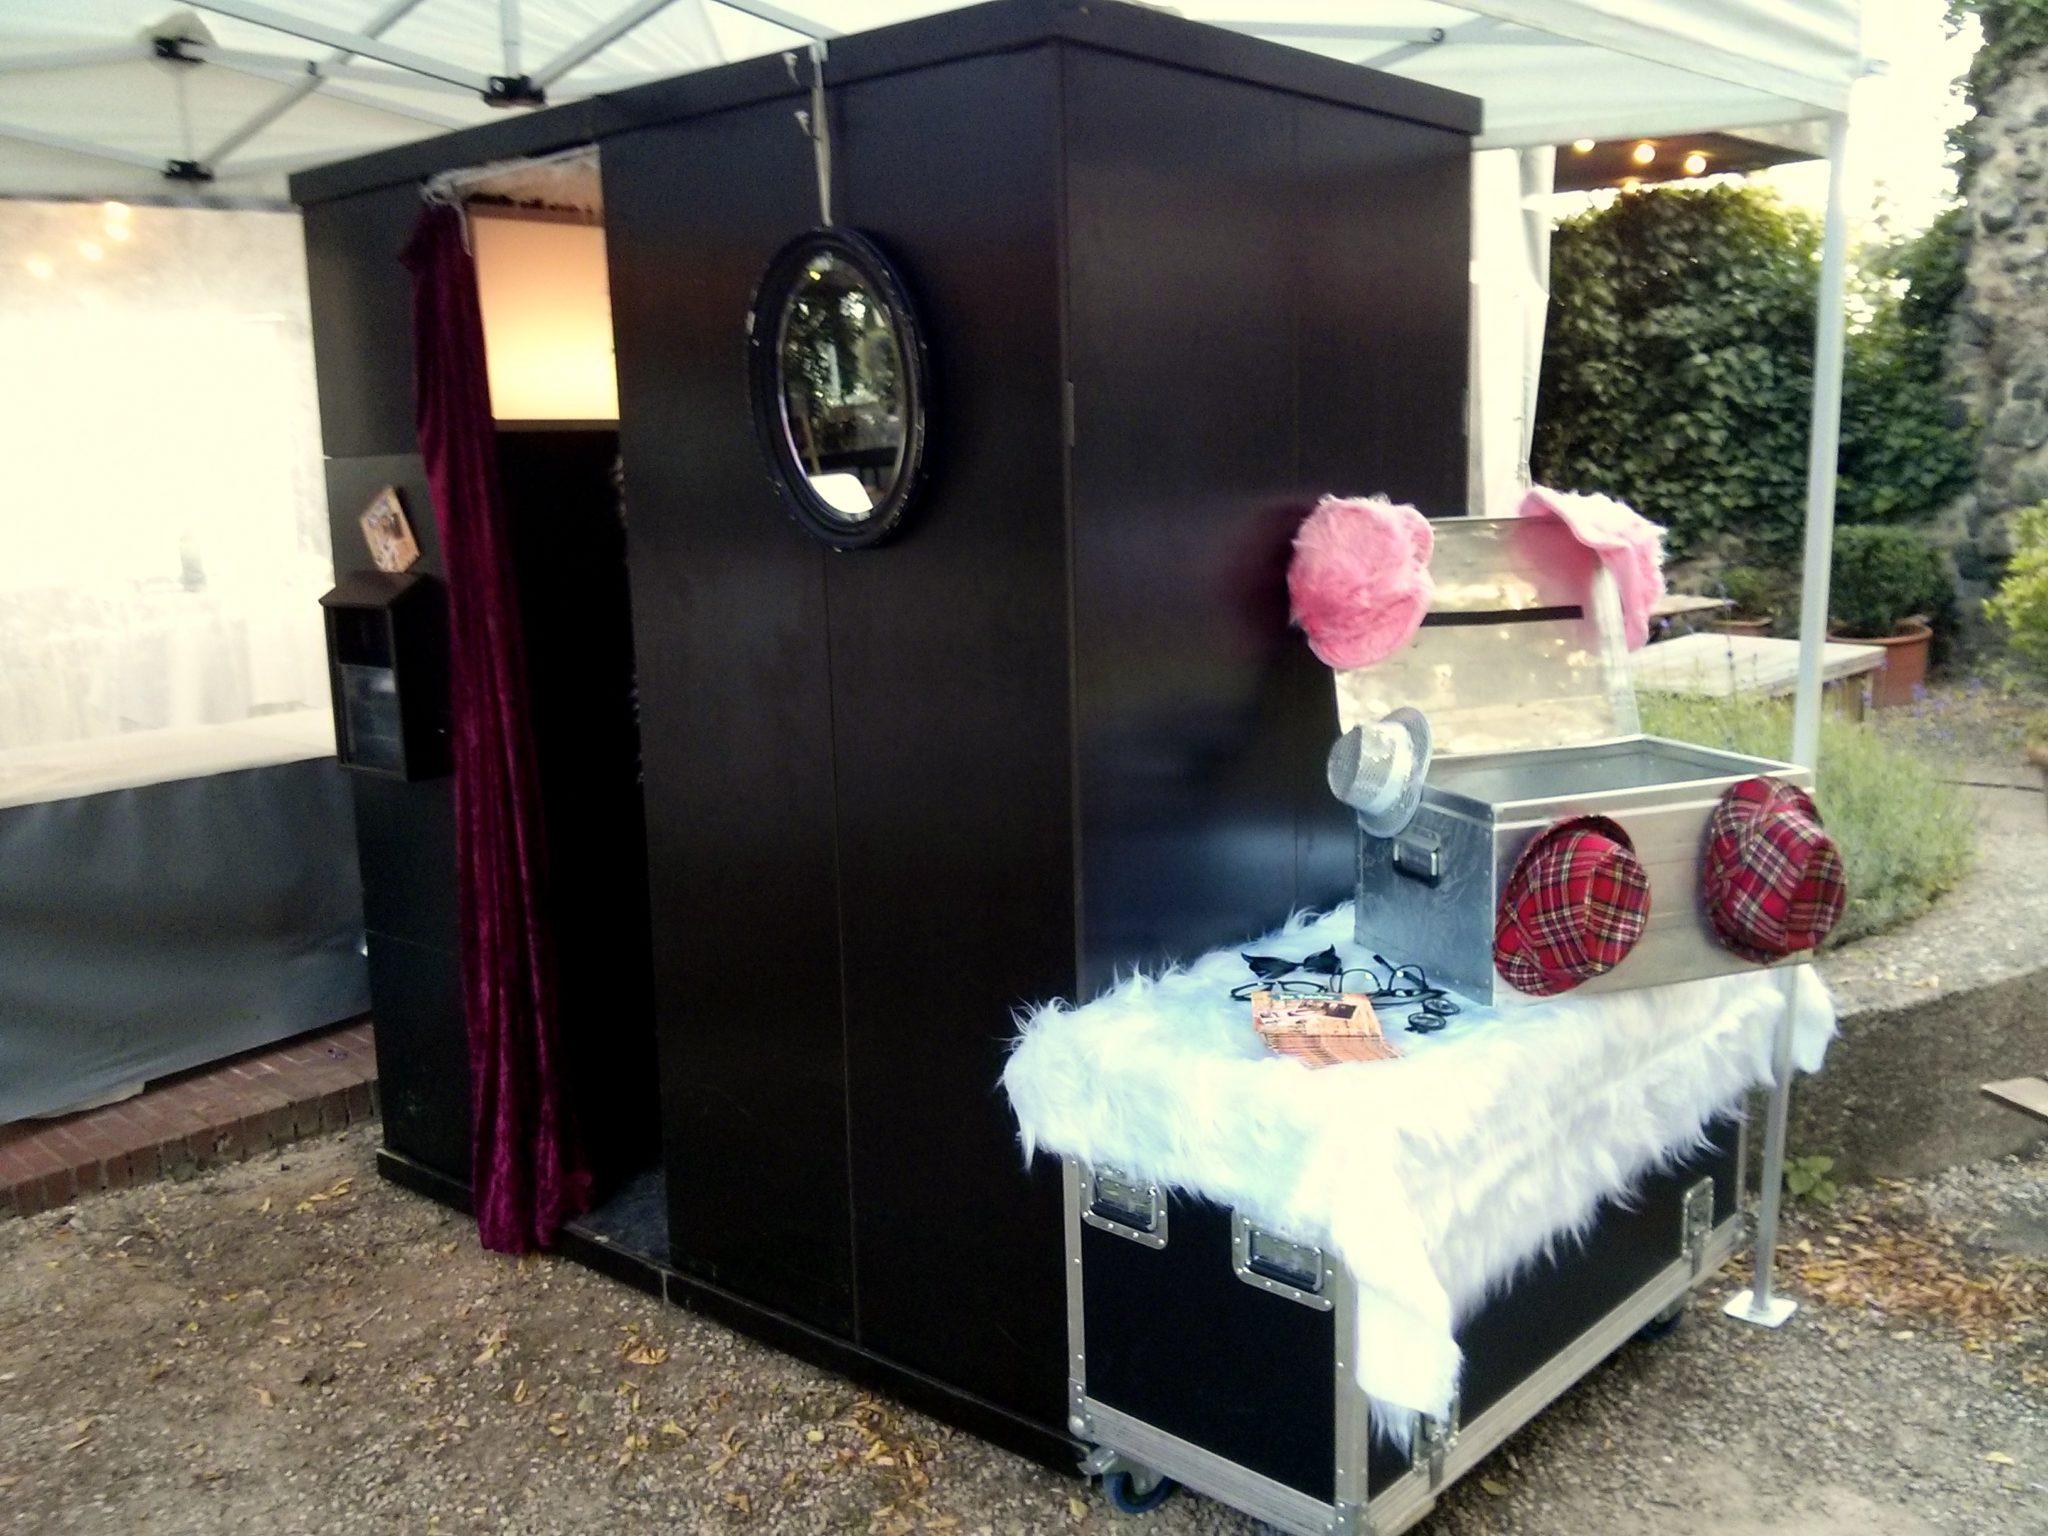 fotoautomat mieten bonn die fotobox. Black Bedroom Furniture Sets. Home Design Ideas